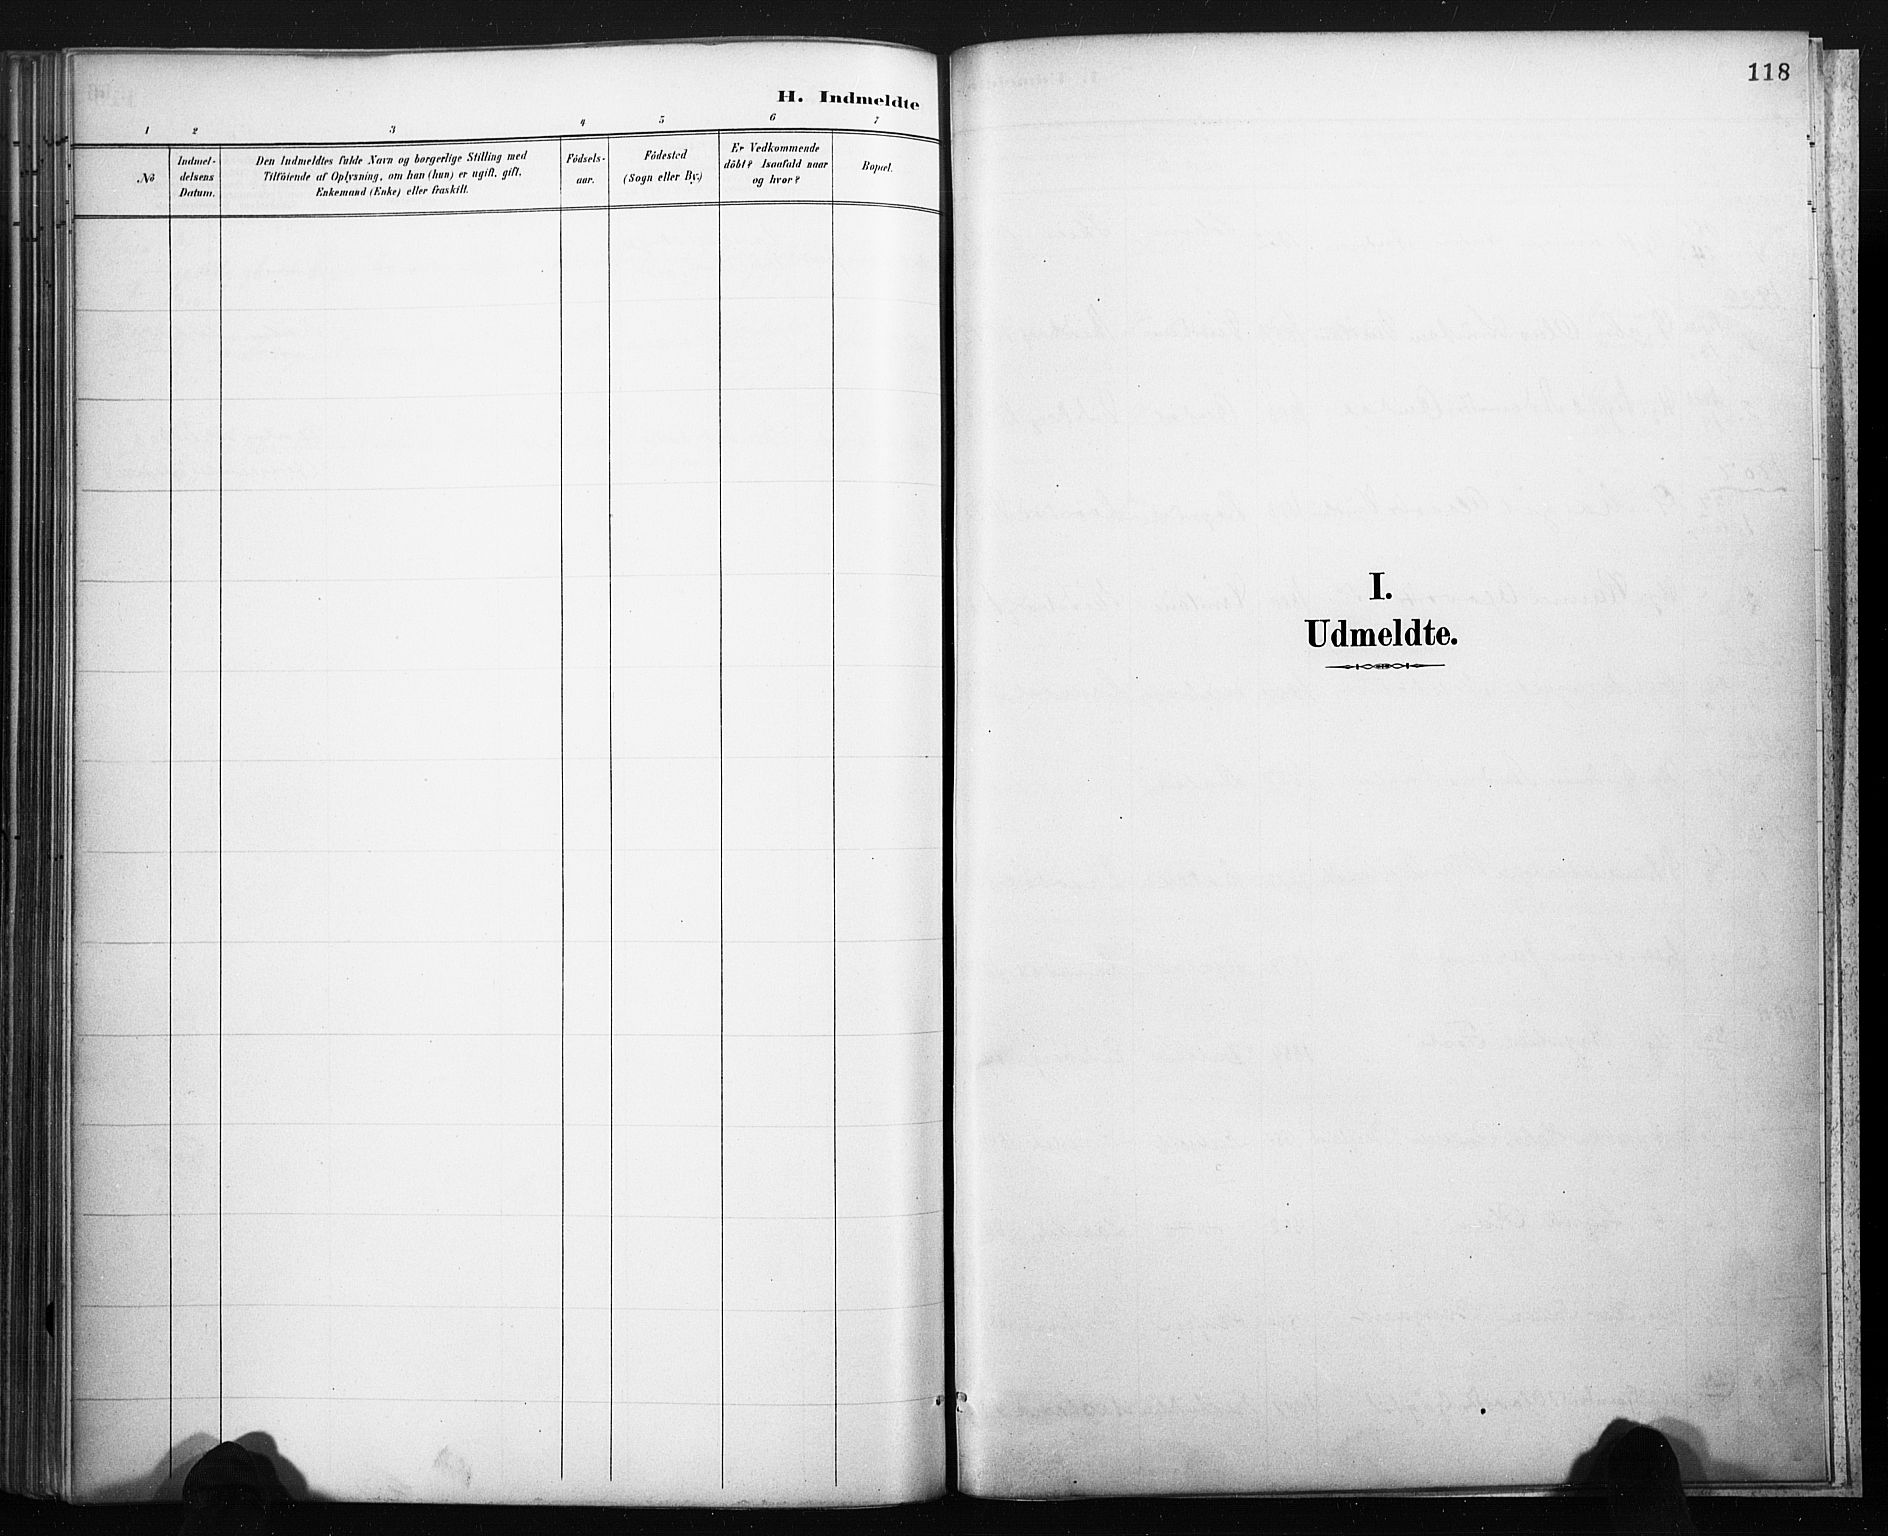 SAKO, Lårdal kirkebøker, F/Fb/L0002: Ministerialbok nr. II 2, 1887-1918, s. 118